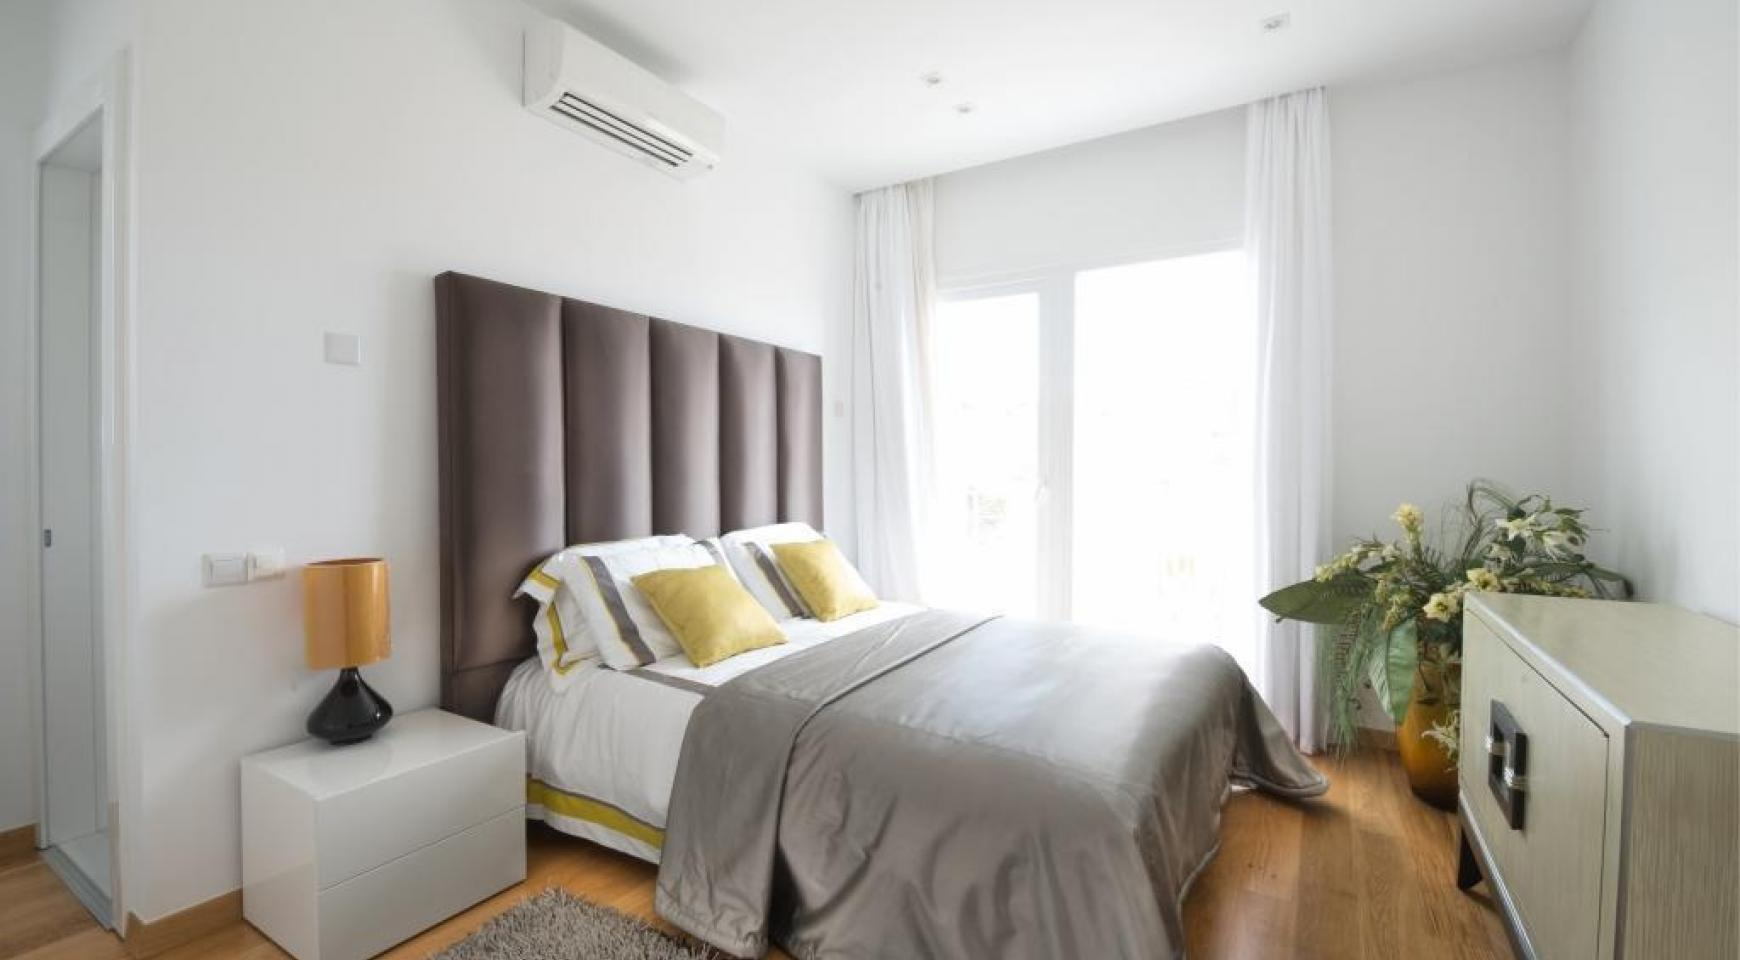 4-Спальная Вилла с Видом на Море в Районе Agios Tychonas - 12